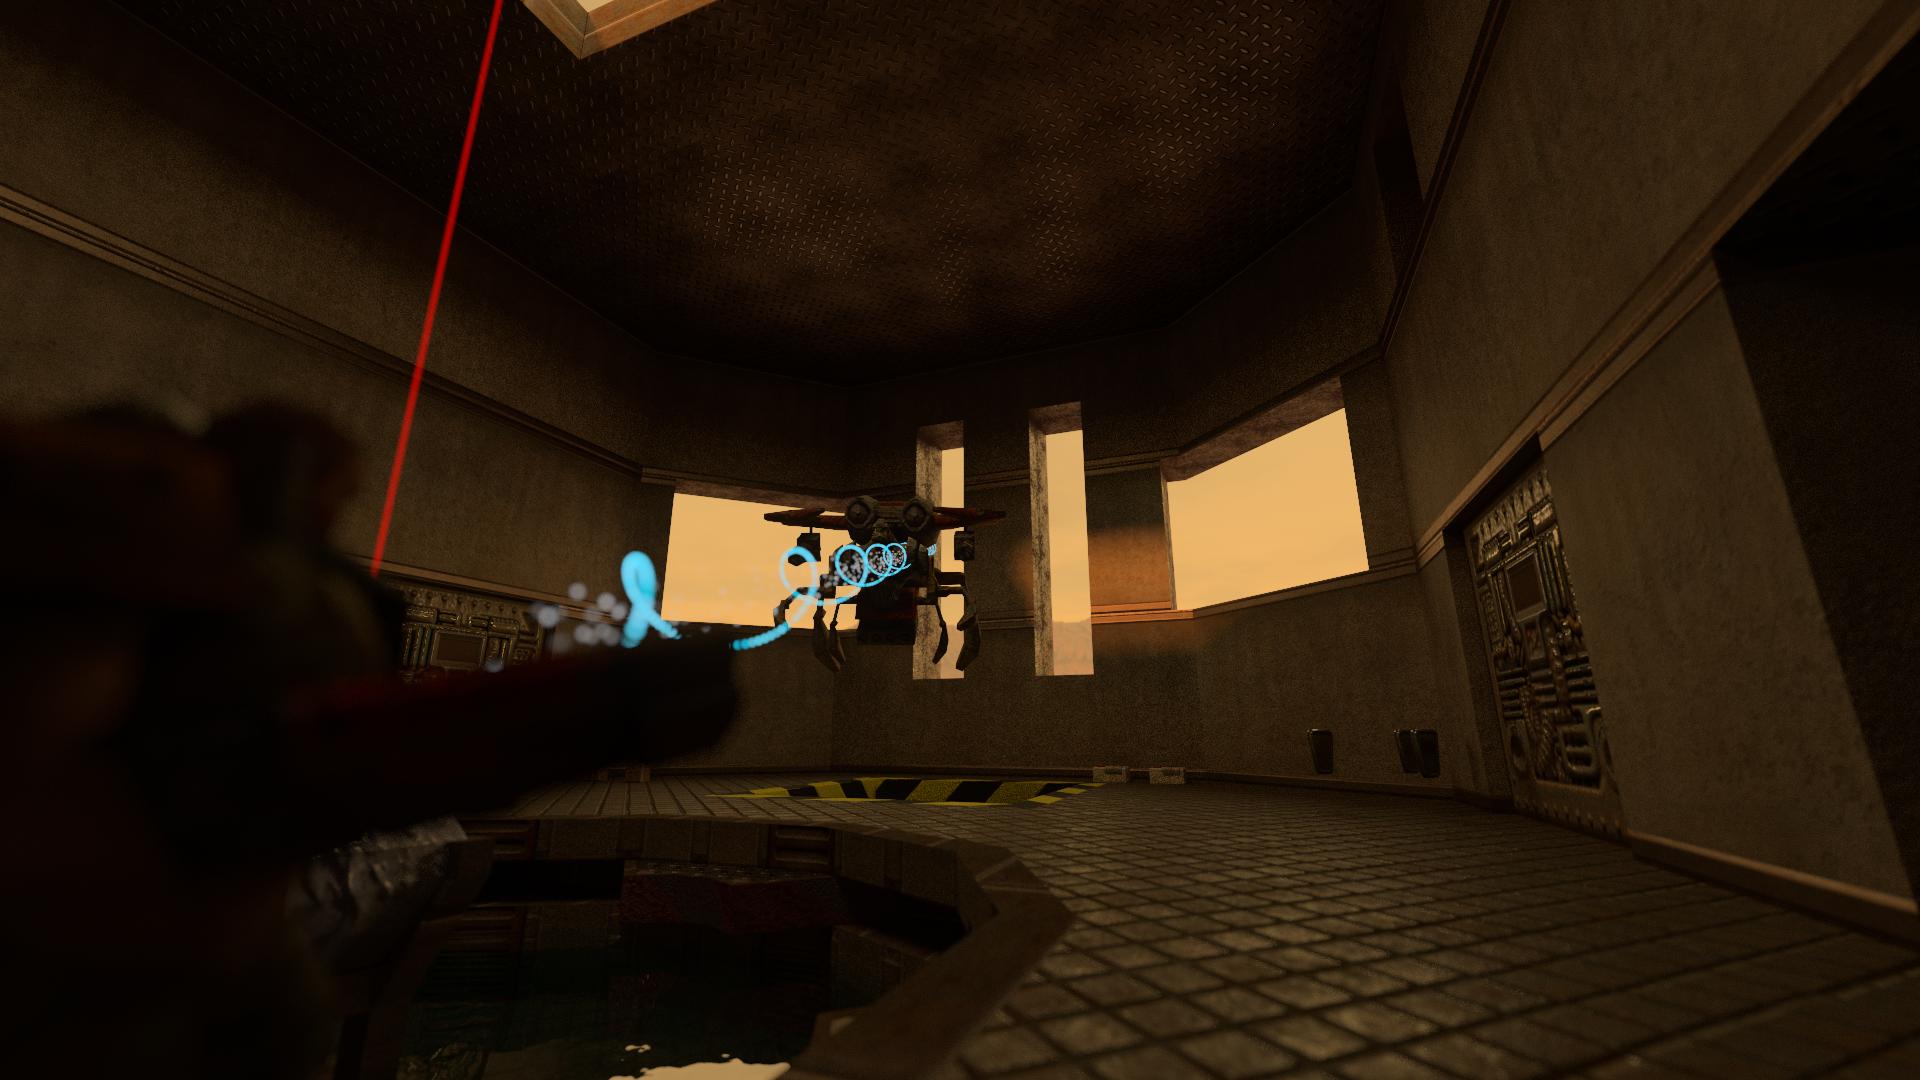 Quake 2 RTX Remaster Screenshot 2020.01.09 - 18.26.45.59.png